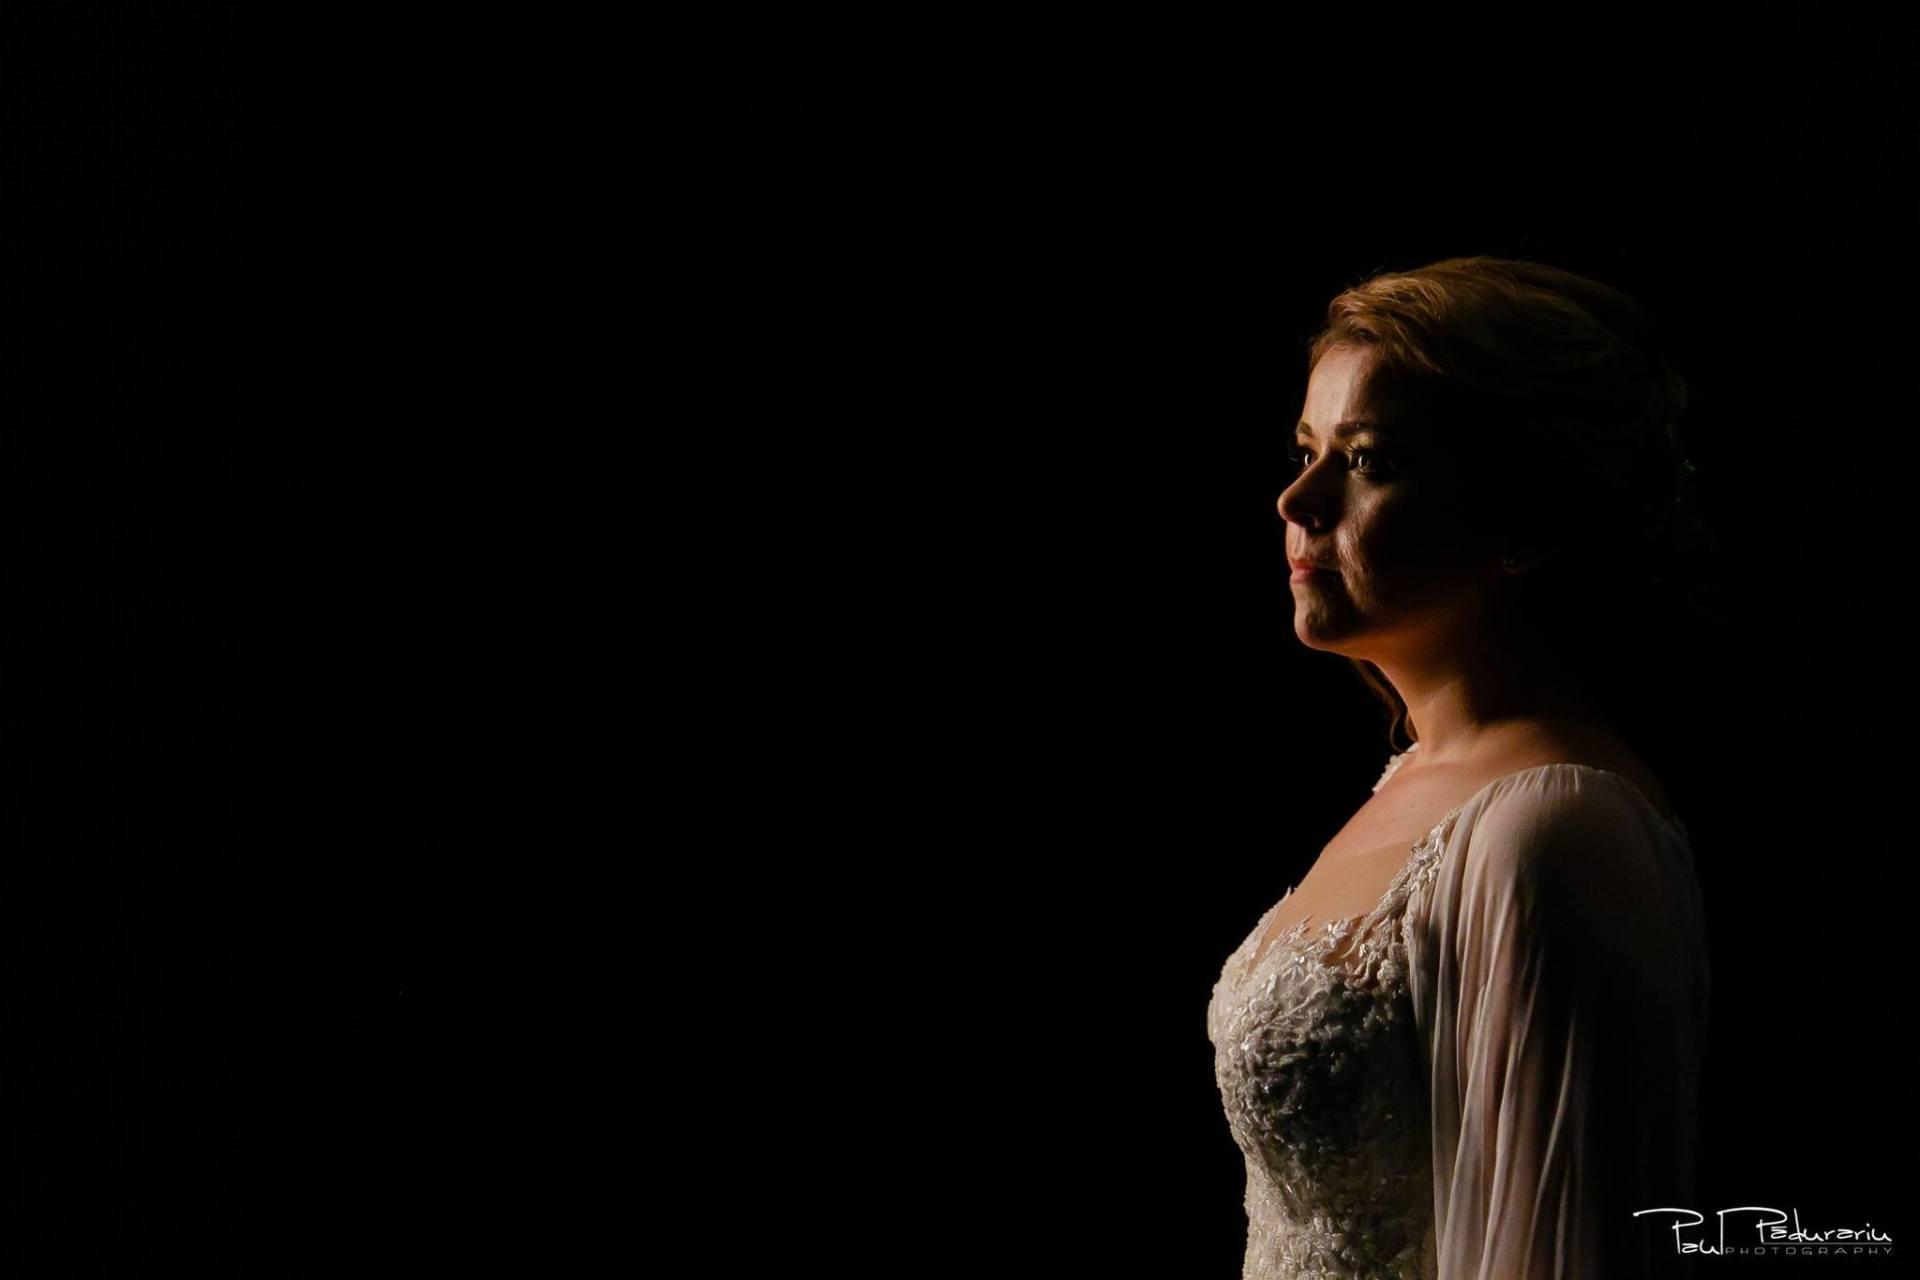 Adriana si Ionut sedinta foto nunta iasi fotograf profesionist paul padurariu 2019